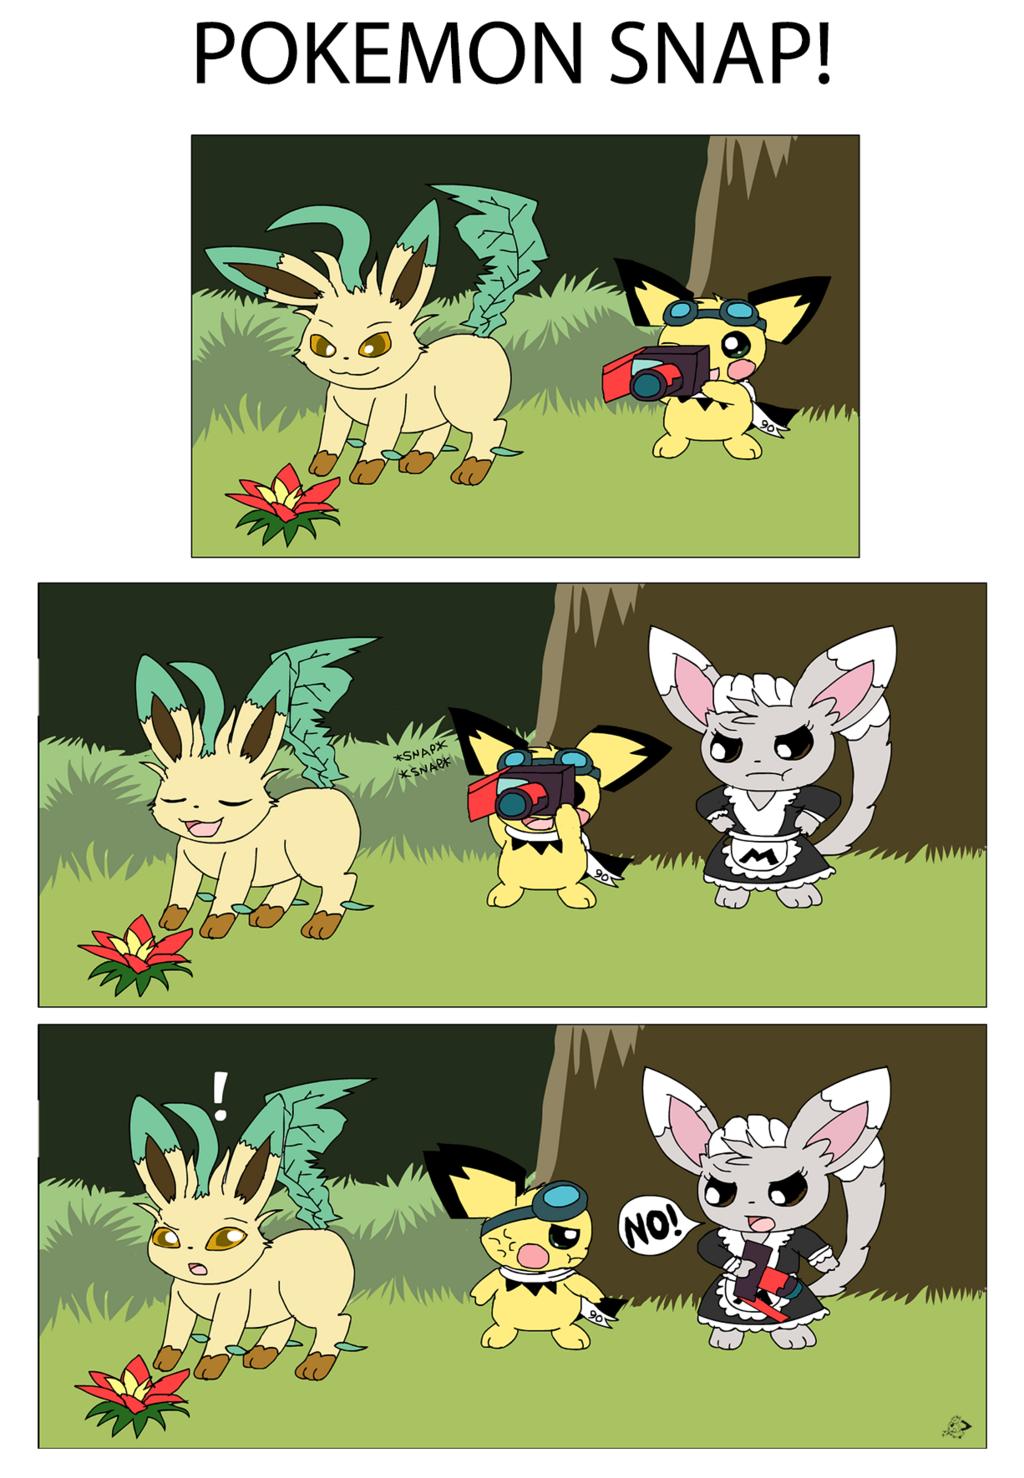 Pokemon Snap!